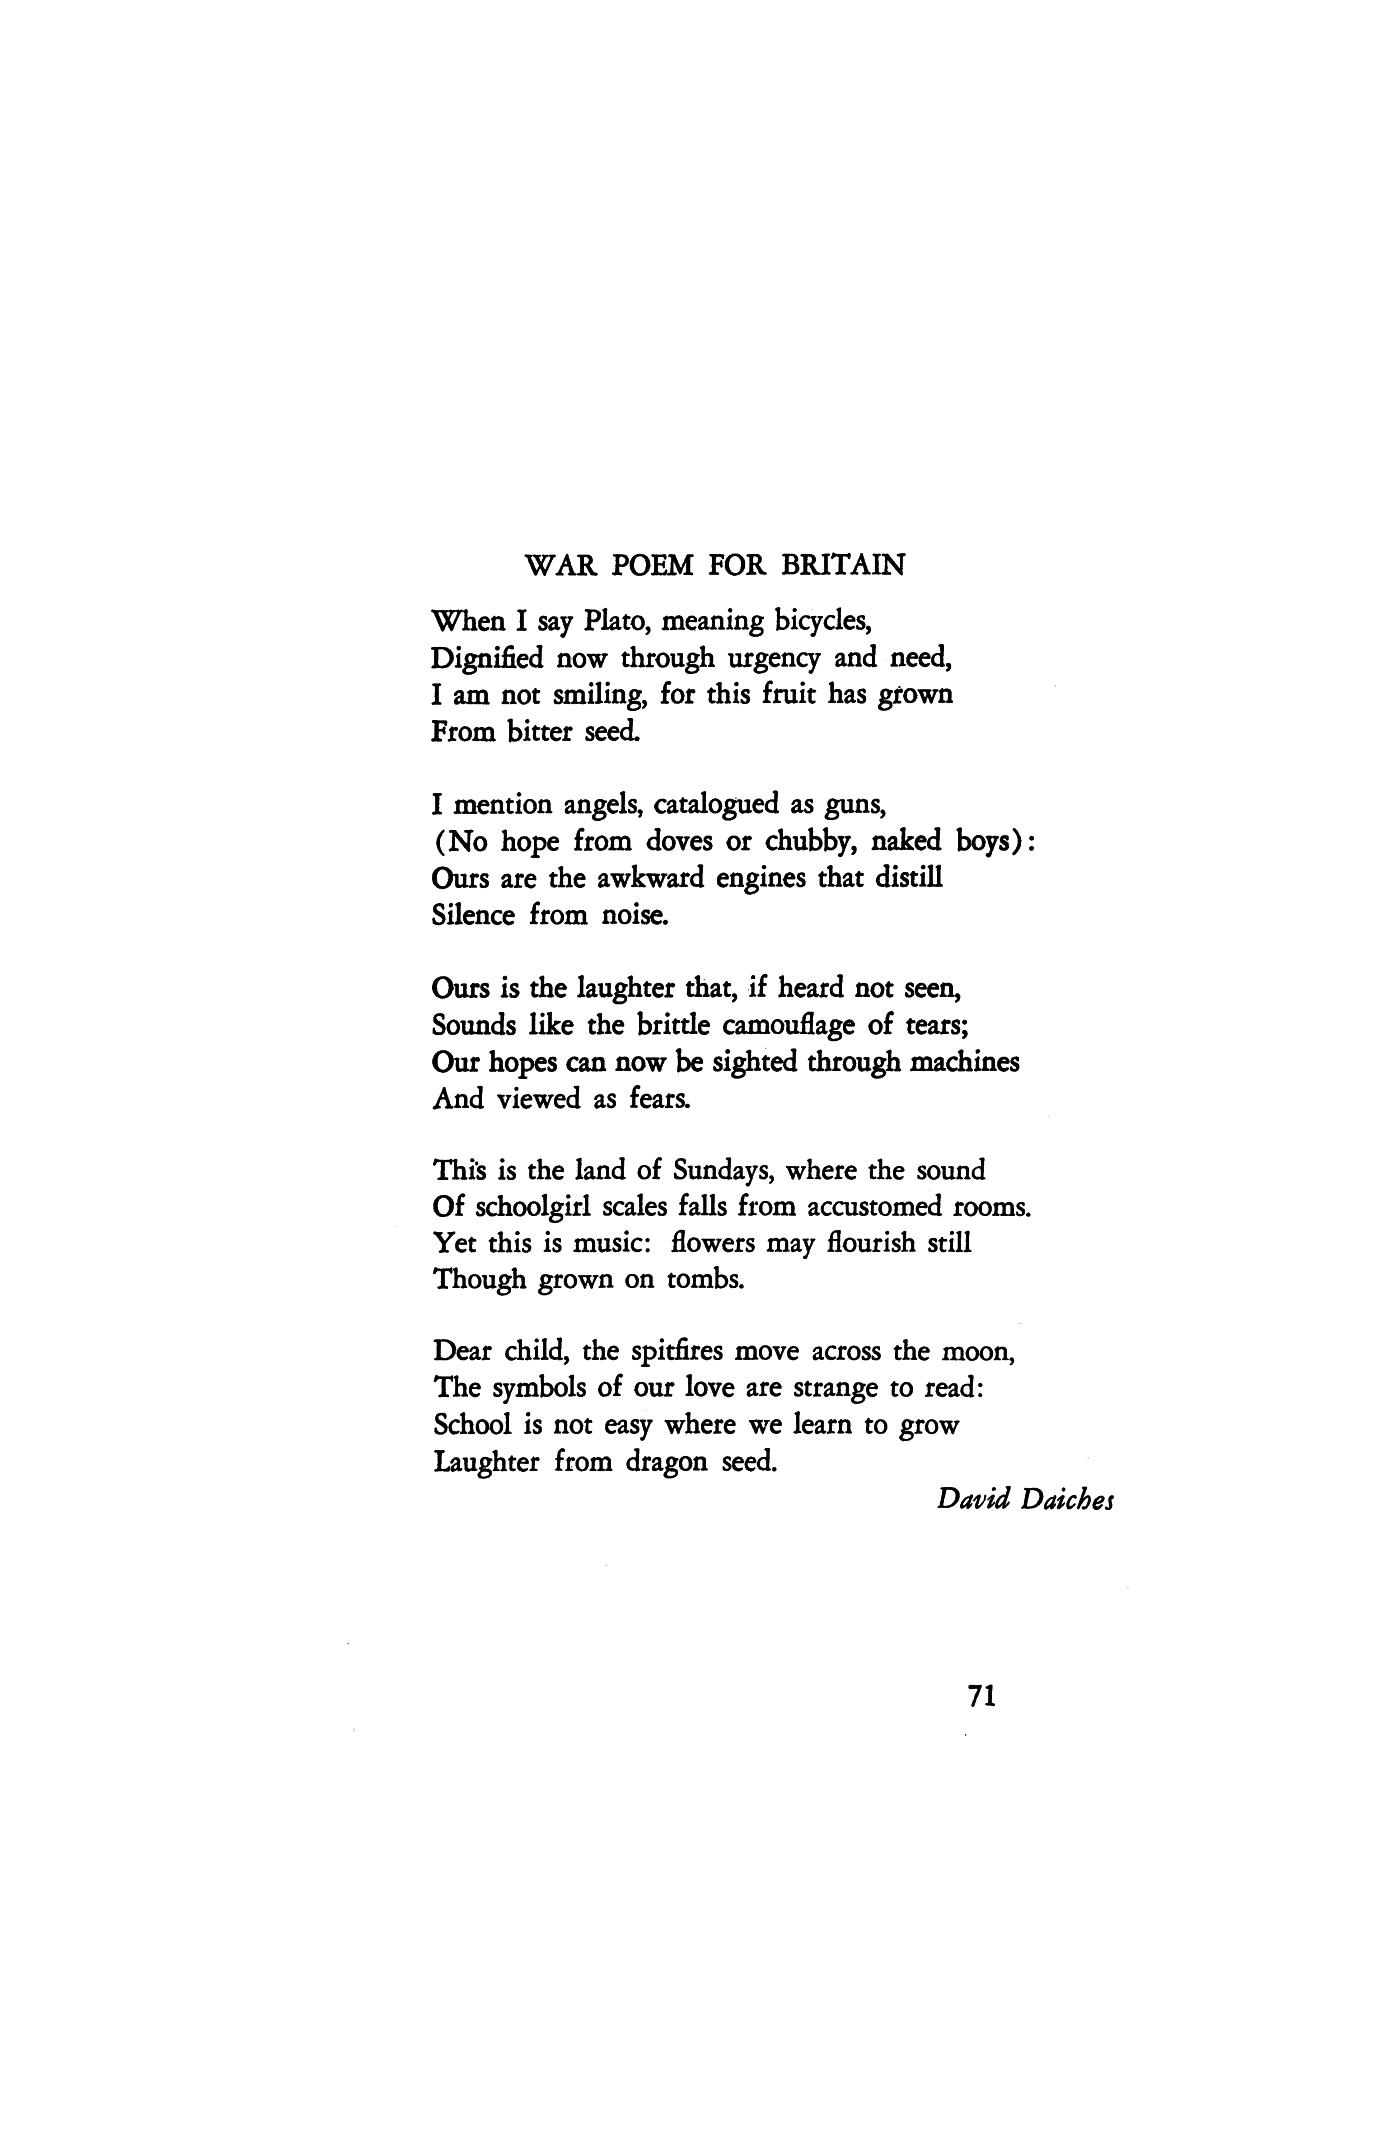 War Poem for Britain by David Daiches | Poetry Magazine